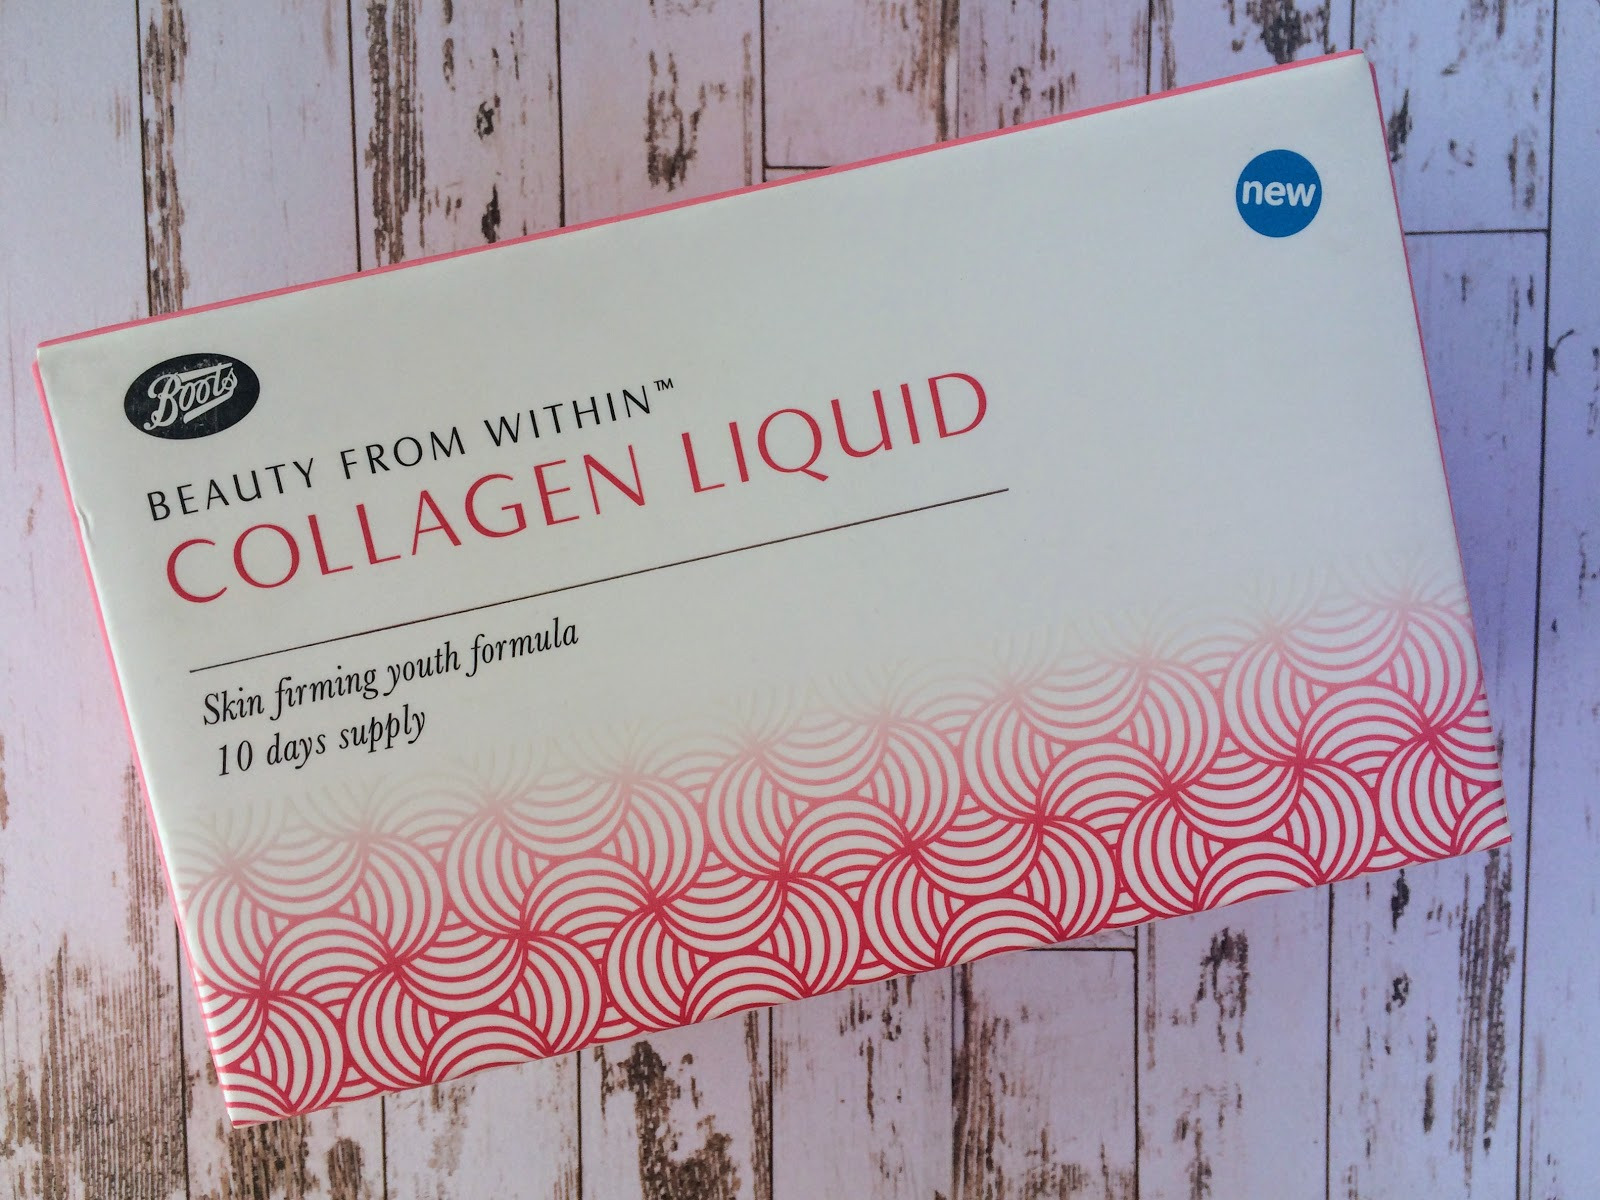 Boots Liquid Collagen